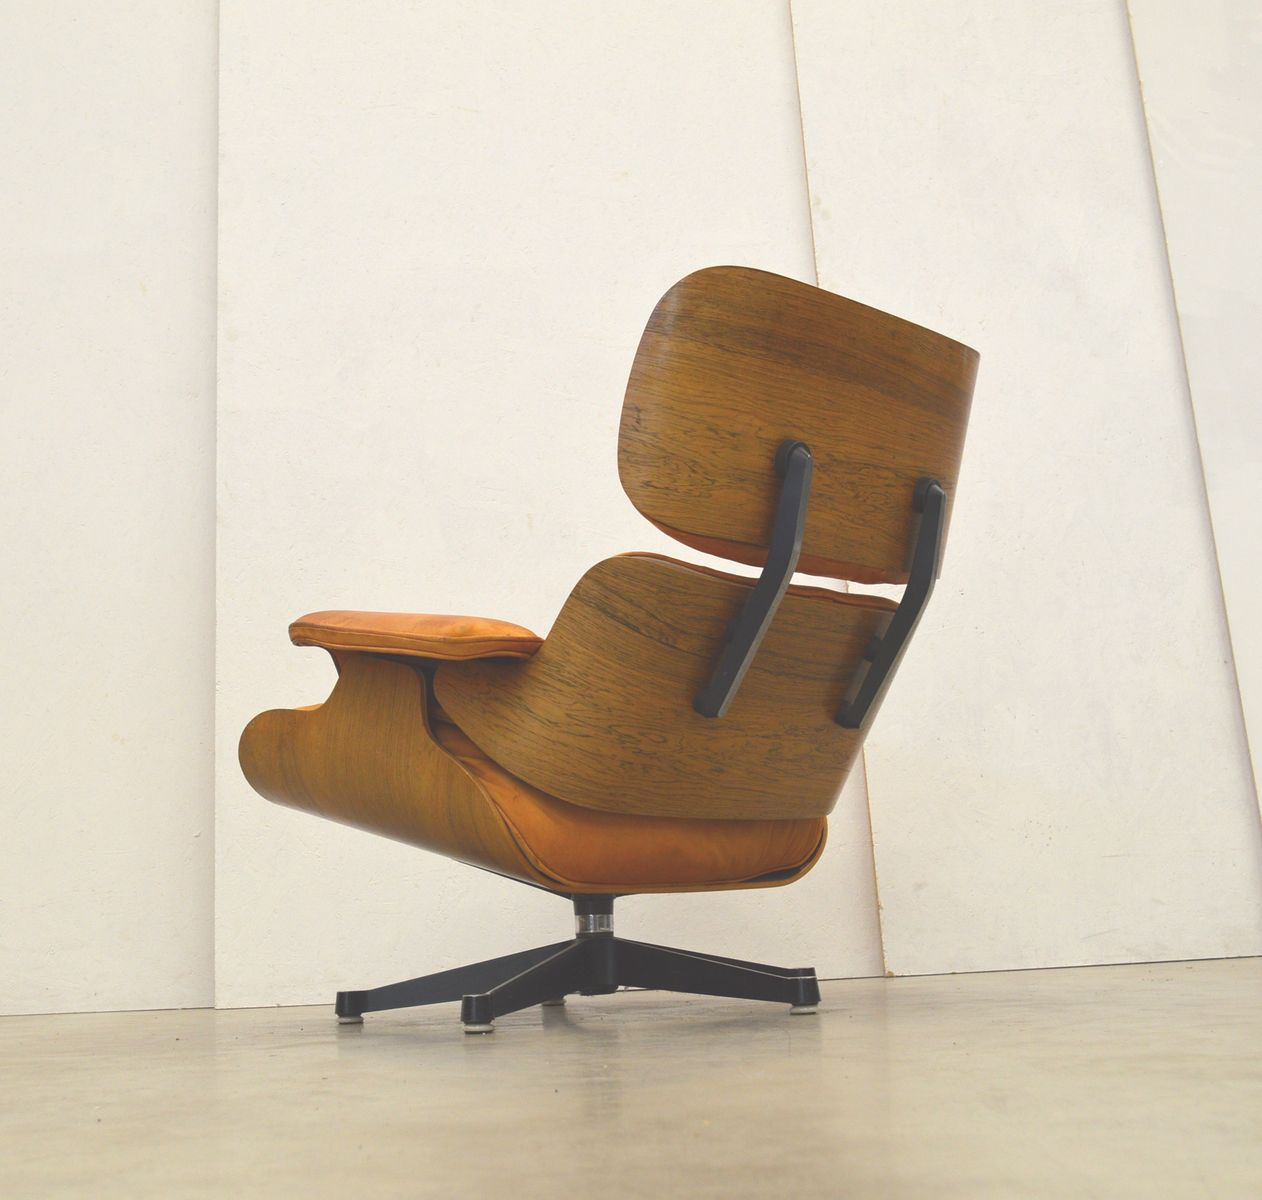 palisander sessel ottoman von charles ray eames f r herman miller 1970er bei pamono kaufen. Black Bedroom Furniture Sets. Home Design Ideas